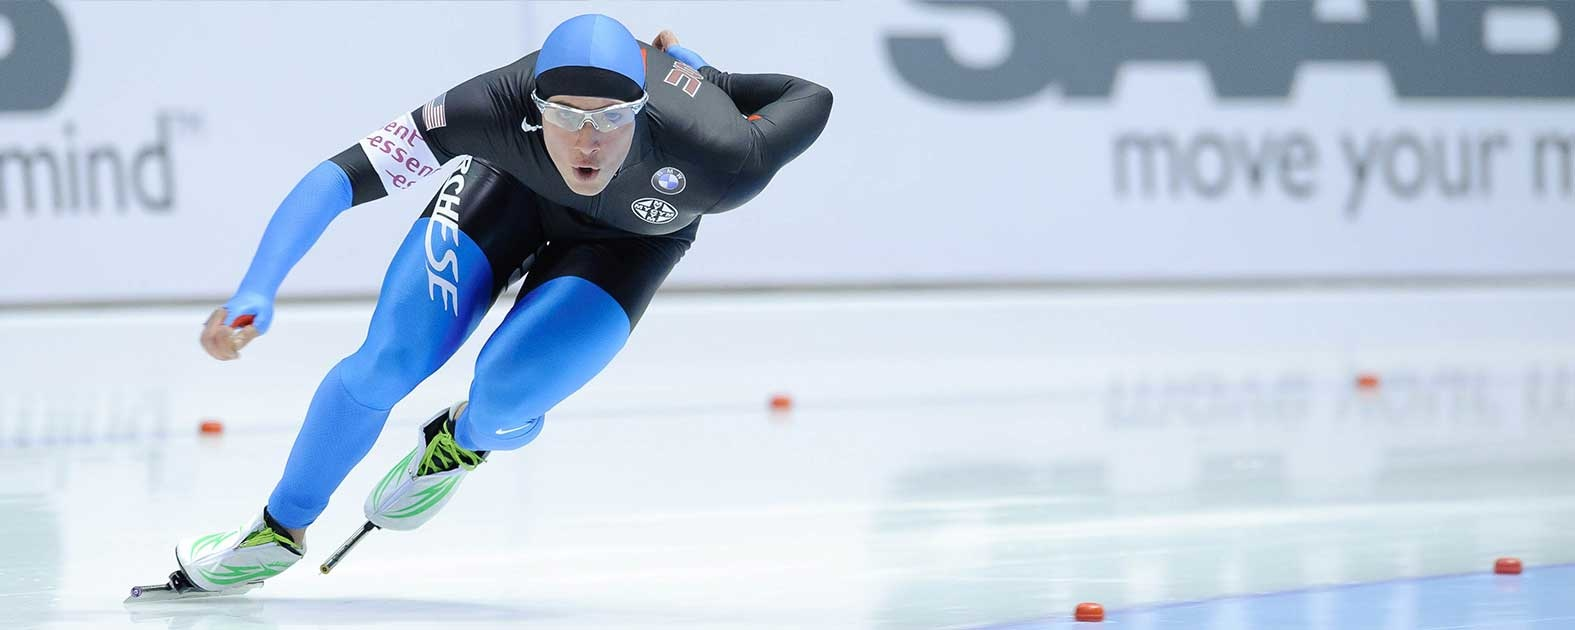 Trevor Marsicano sets world record on 1000m